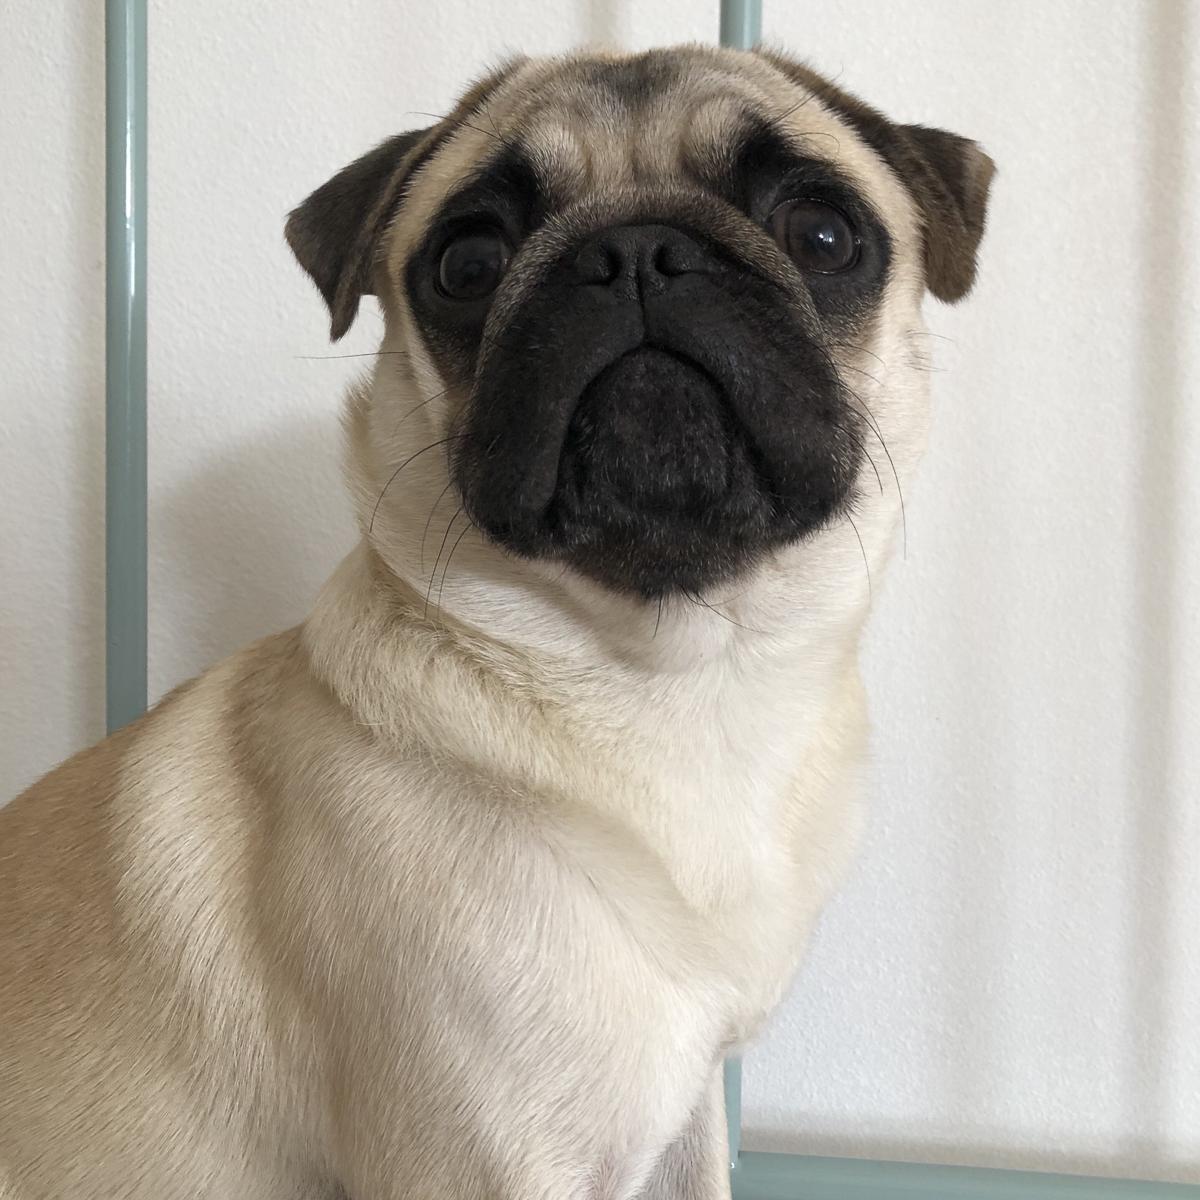 Pugitto's Social Pug Profile | www.thepugdiary.com